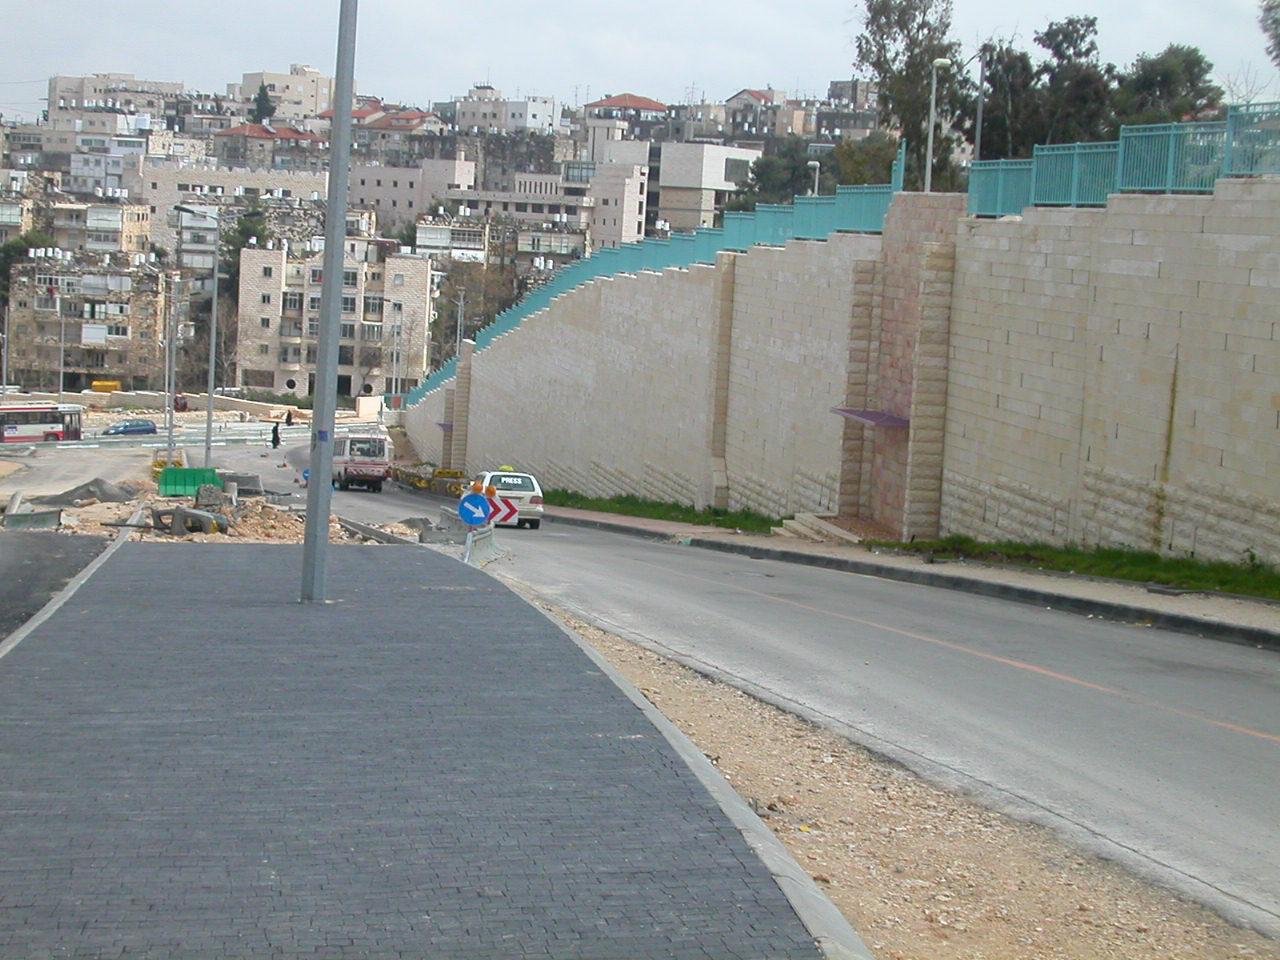 Shamgar-Golda Road